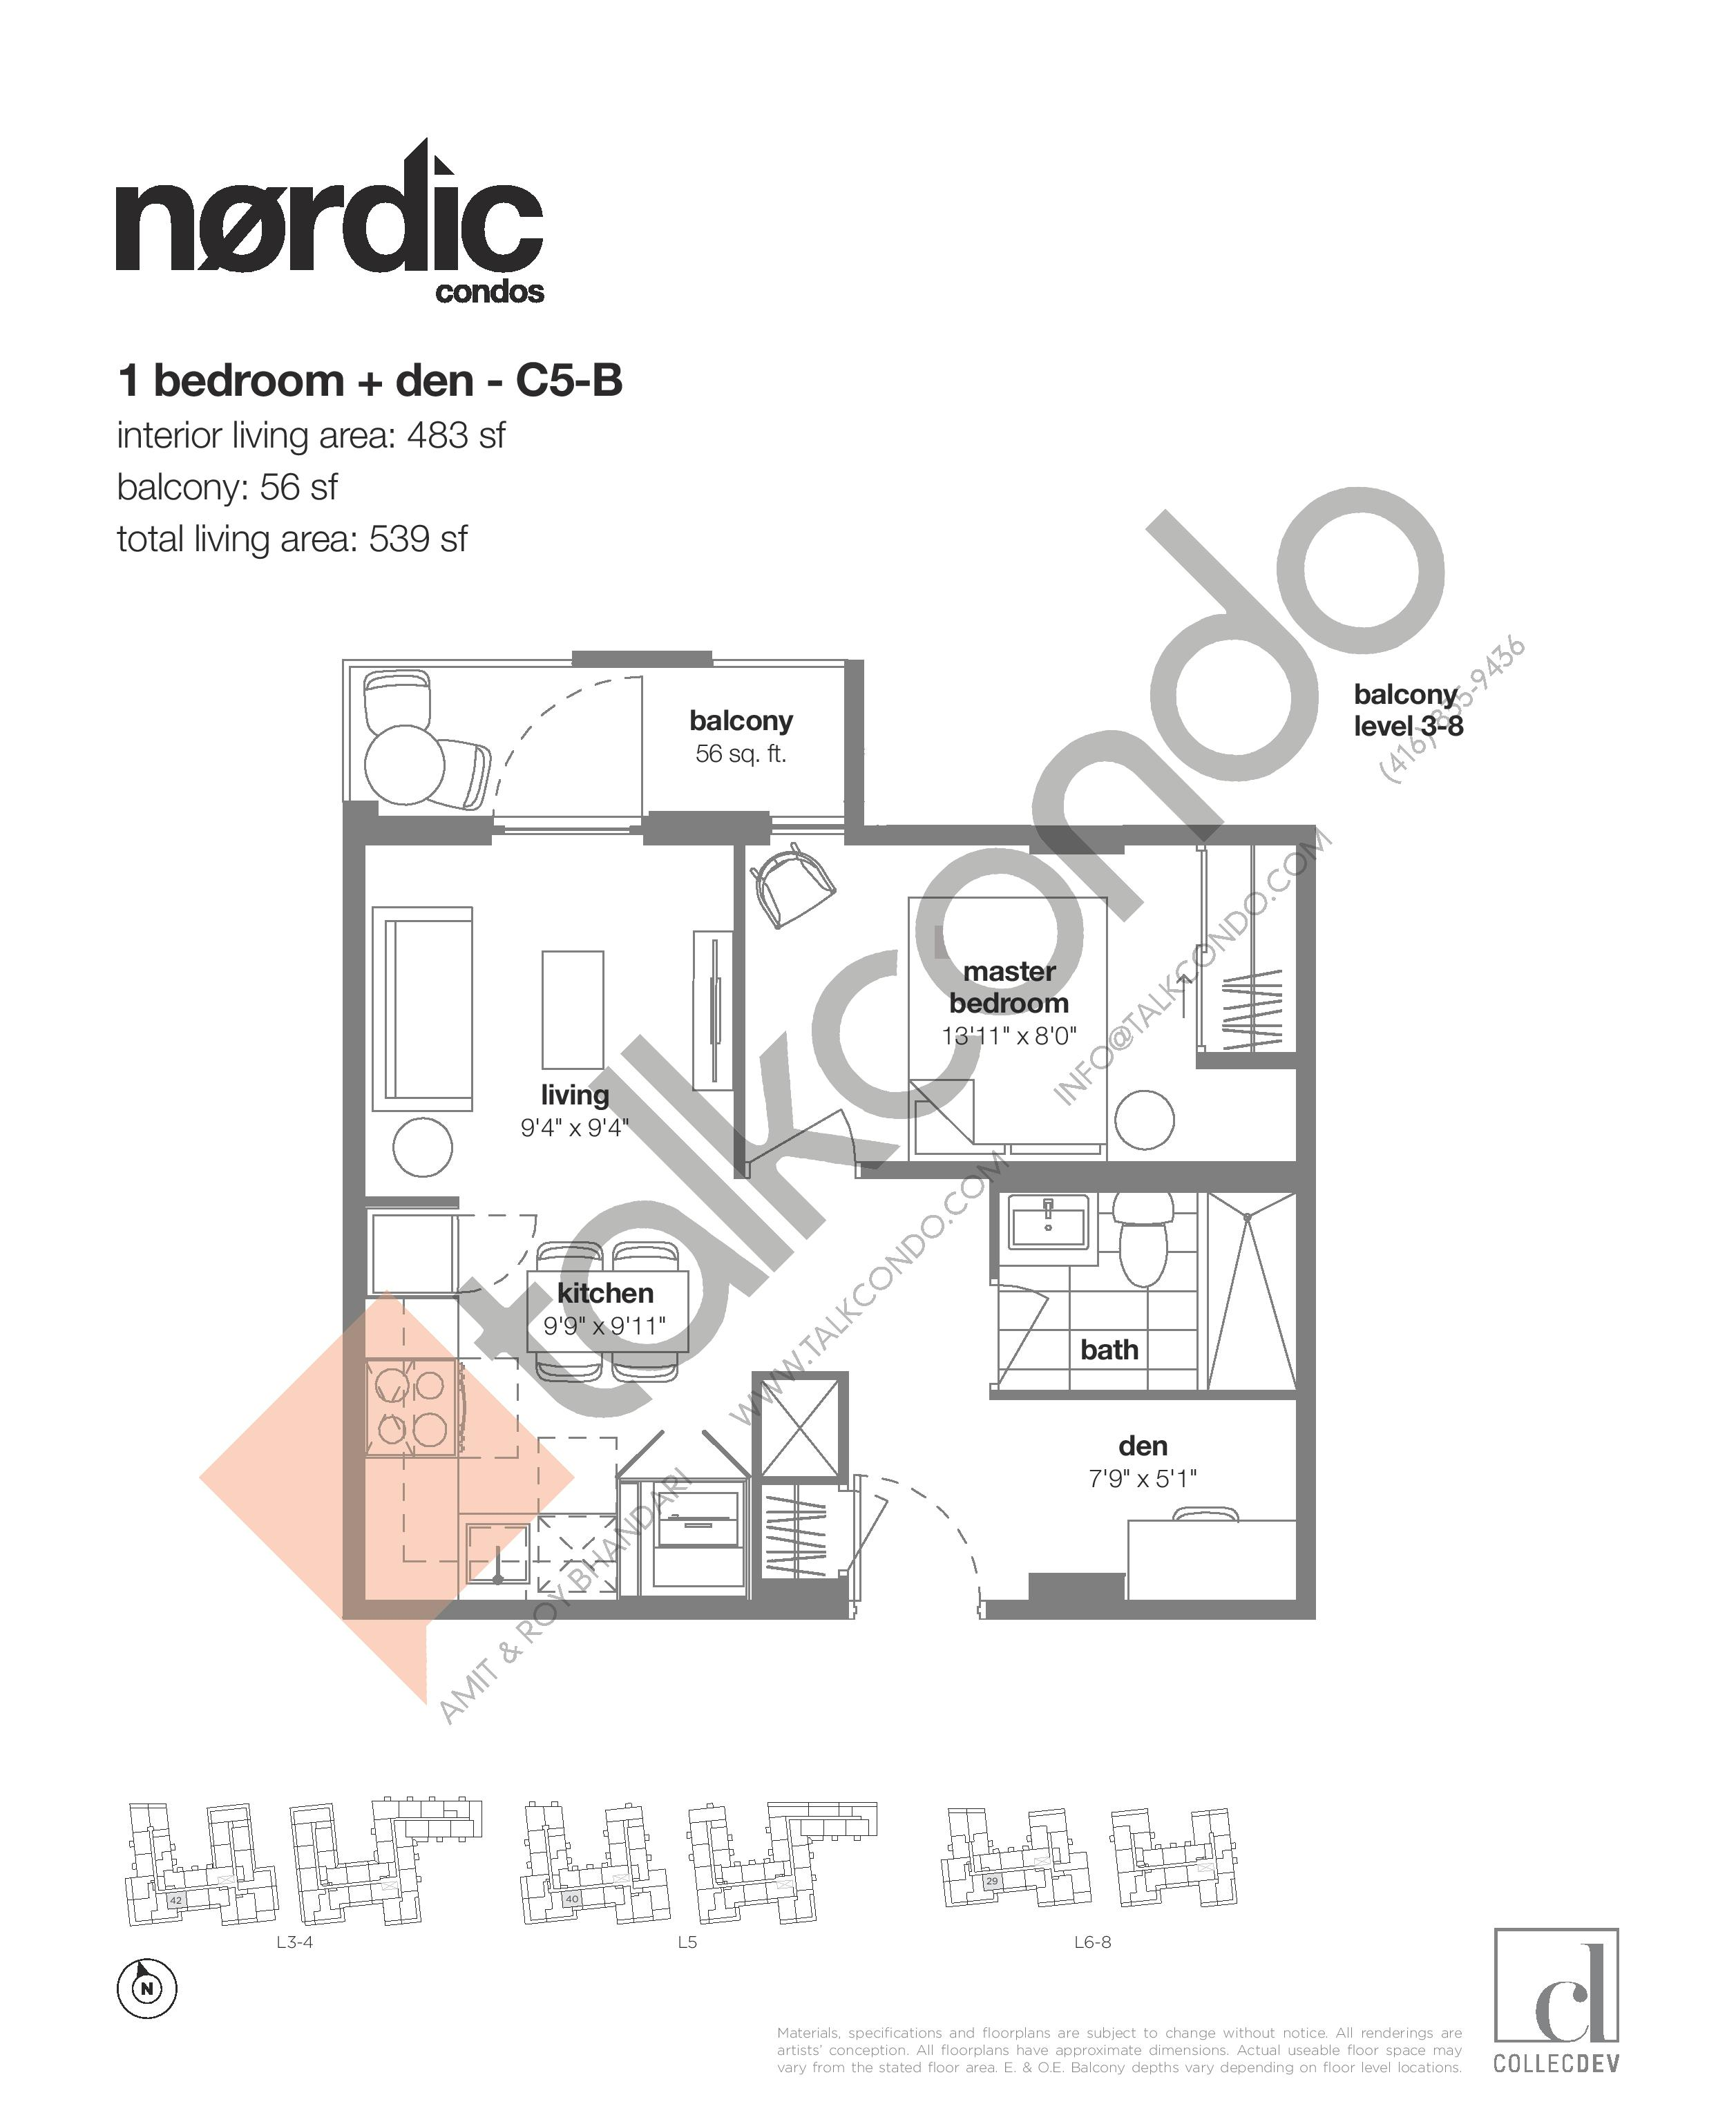 C5-B Floor Plan at Nordic Condos - 483 sq.ft